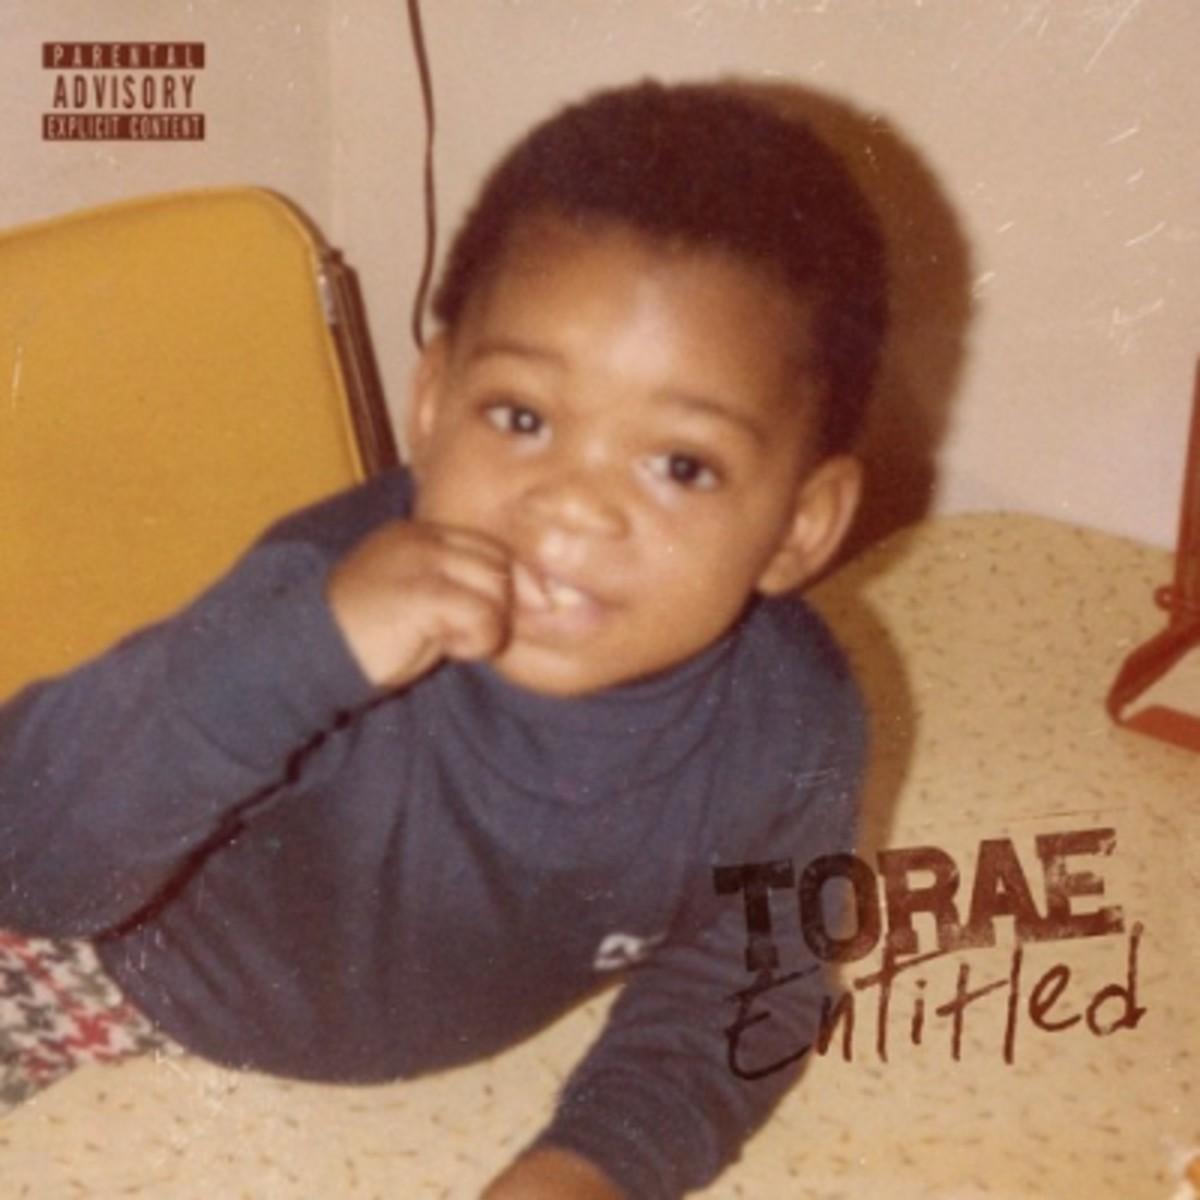 torae-entitled.jpg